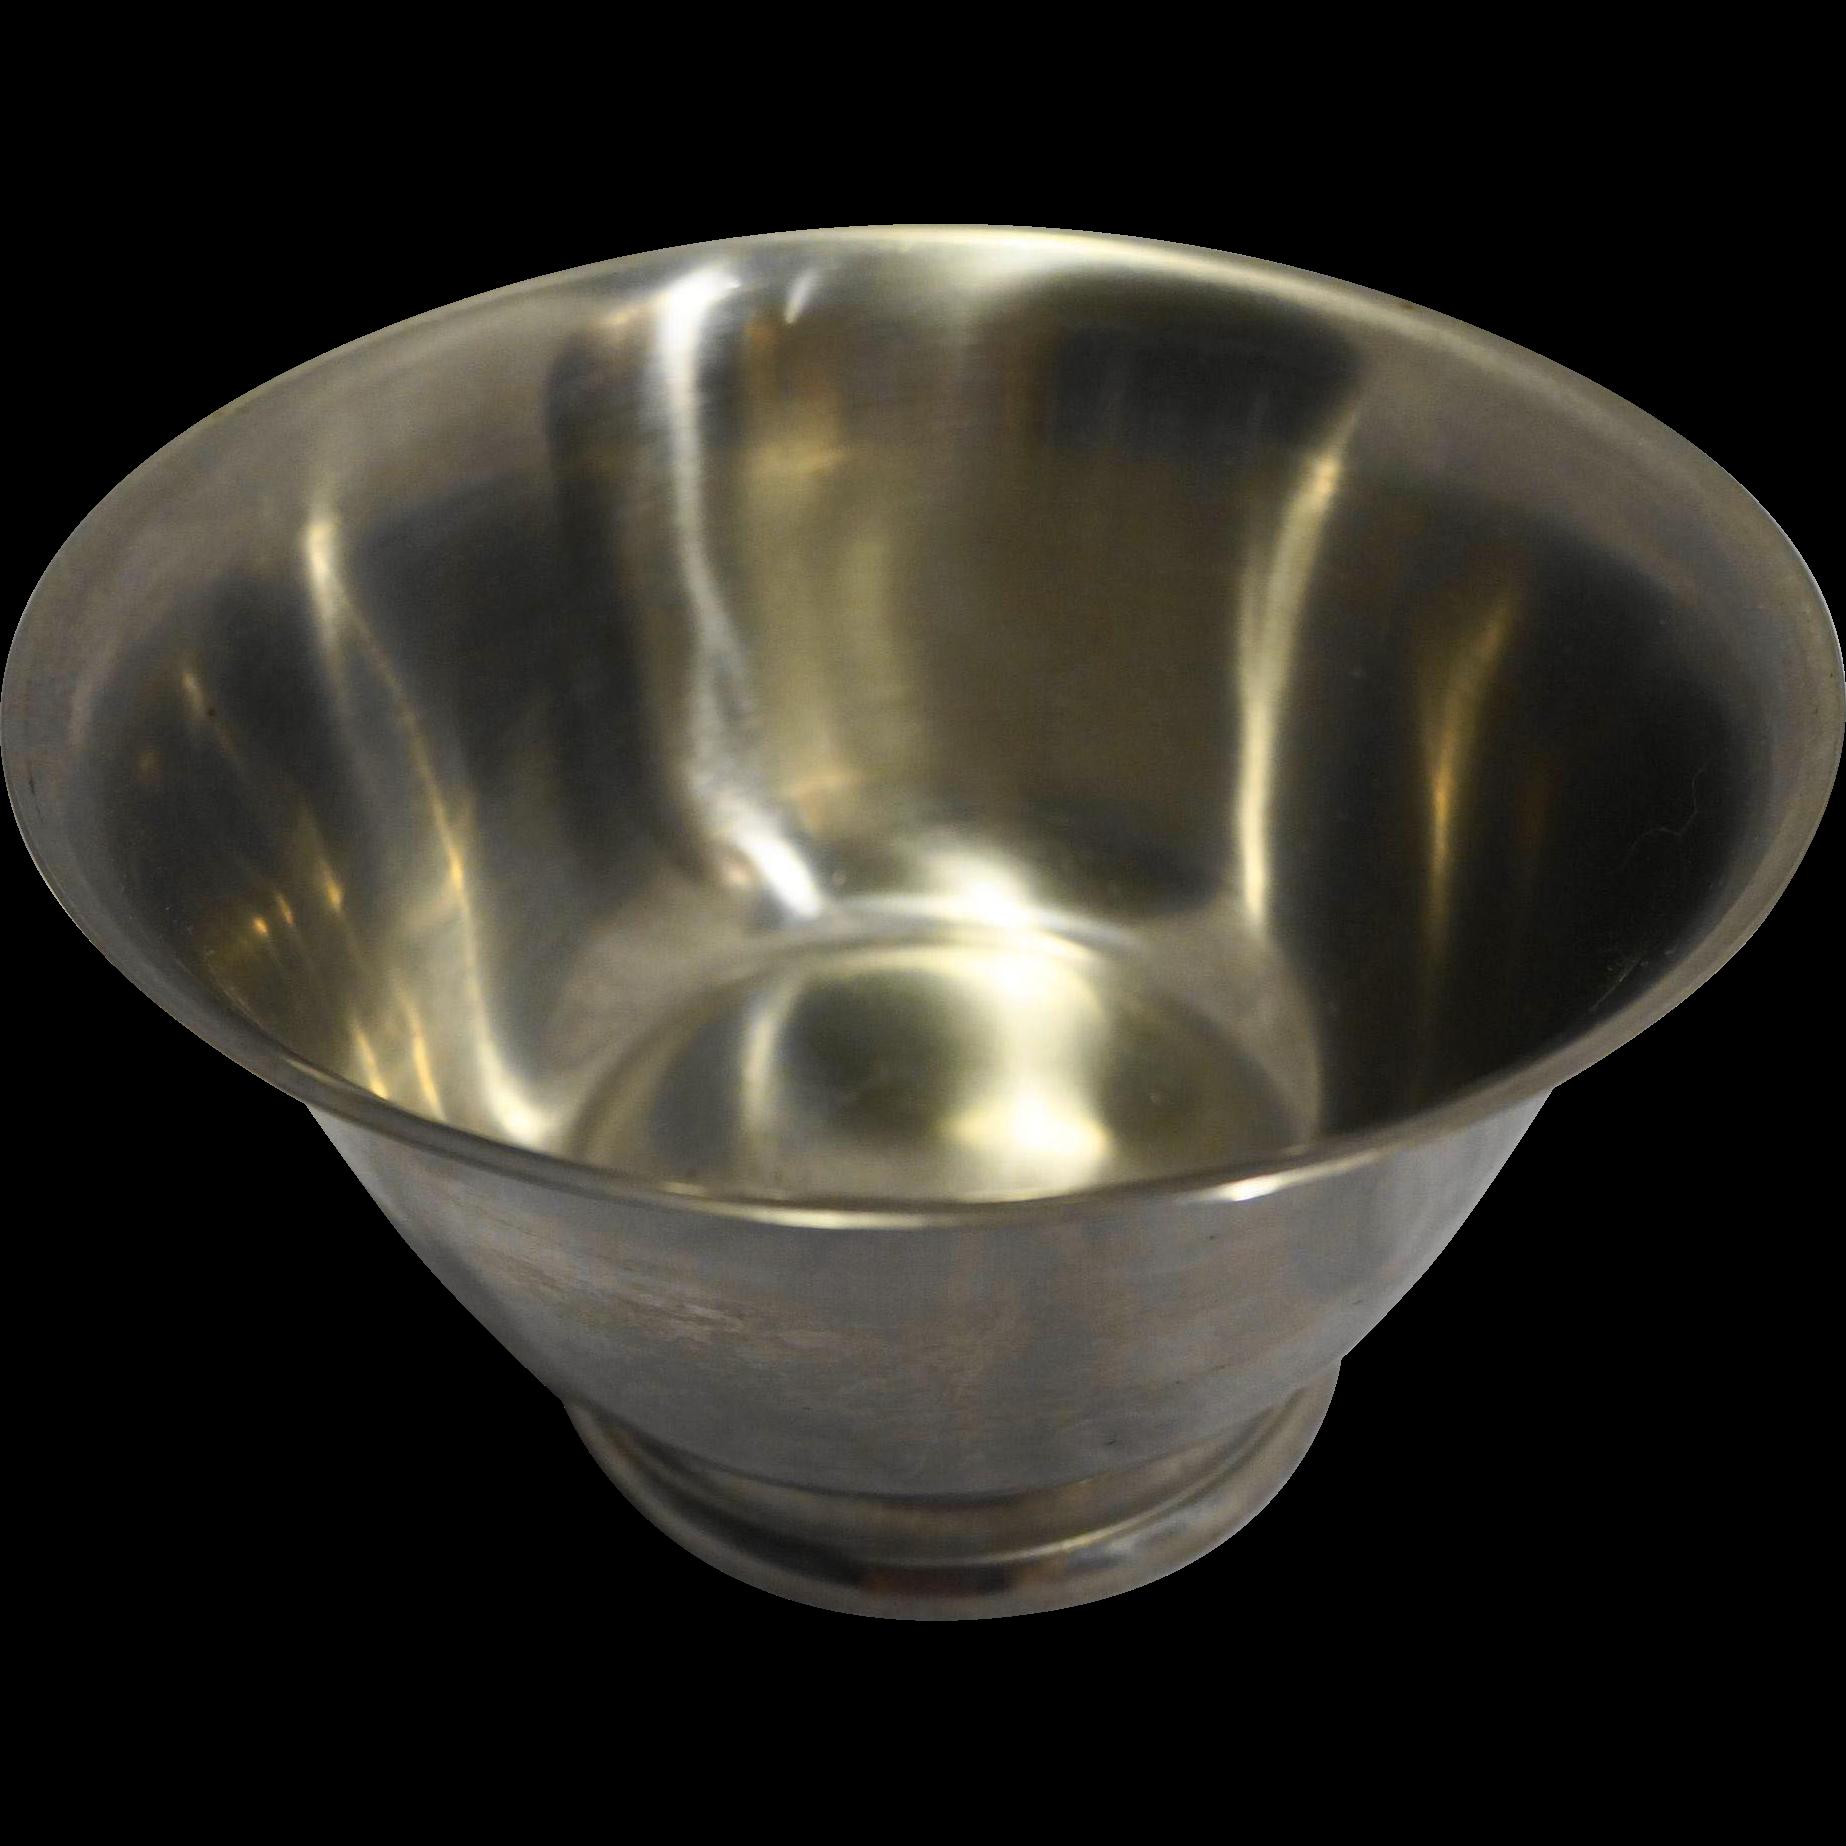 Danish Modern MCM Eames Era Selandia Stainless Steel Small Serving Bowl